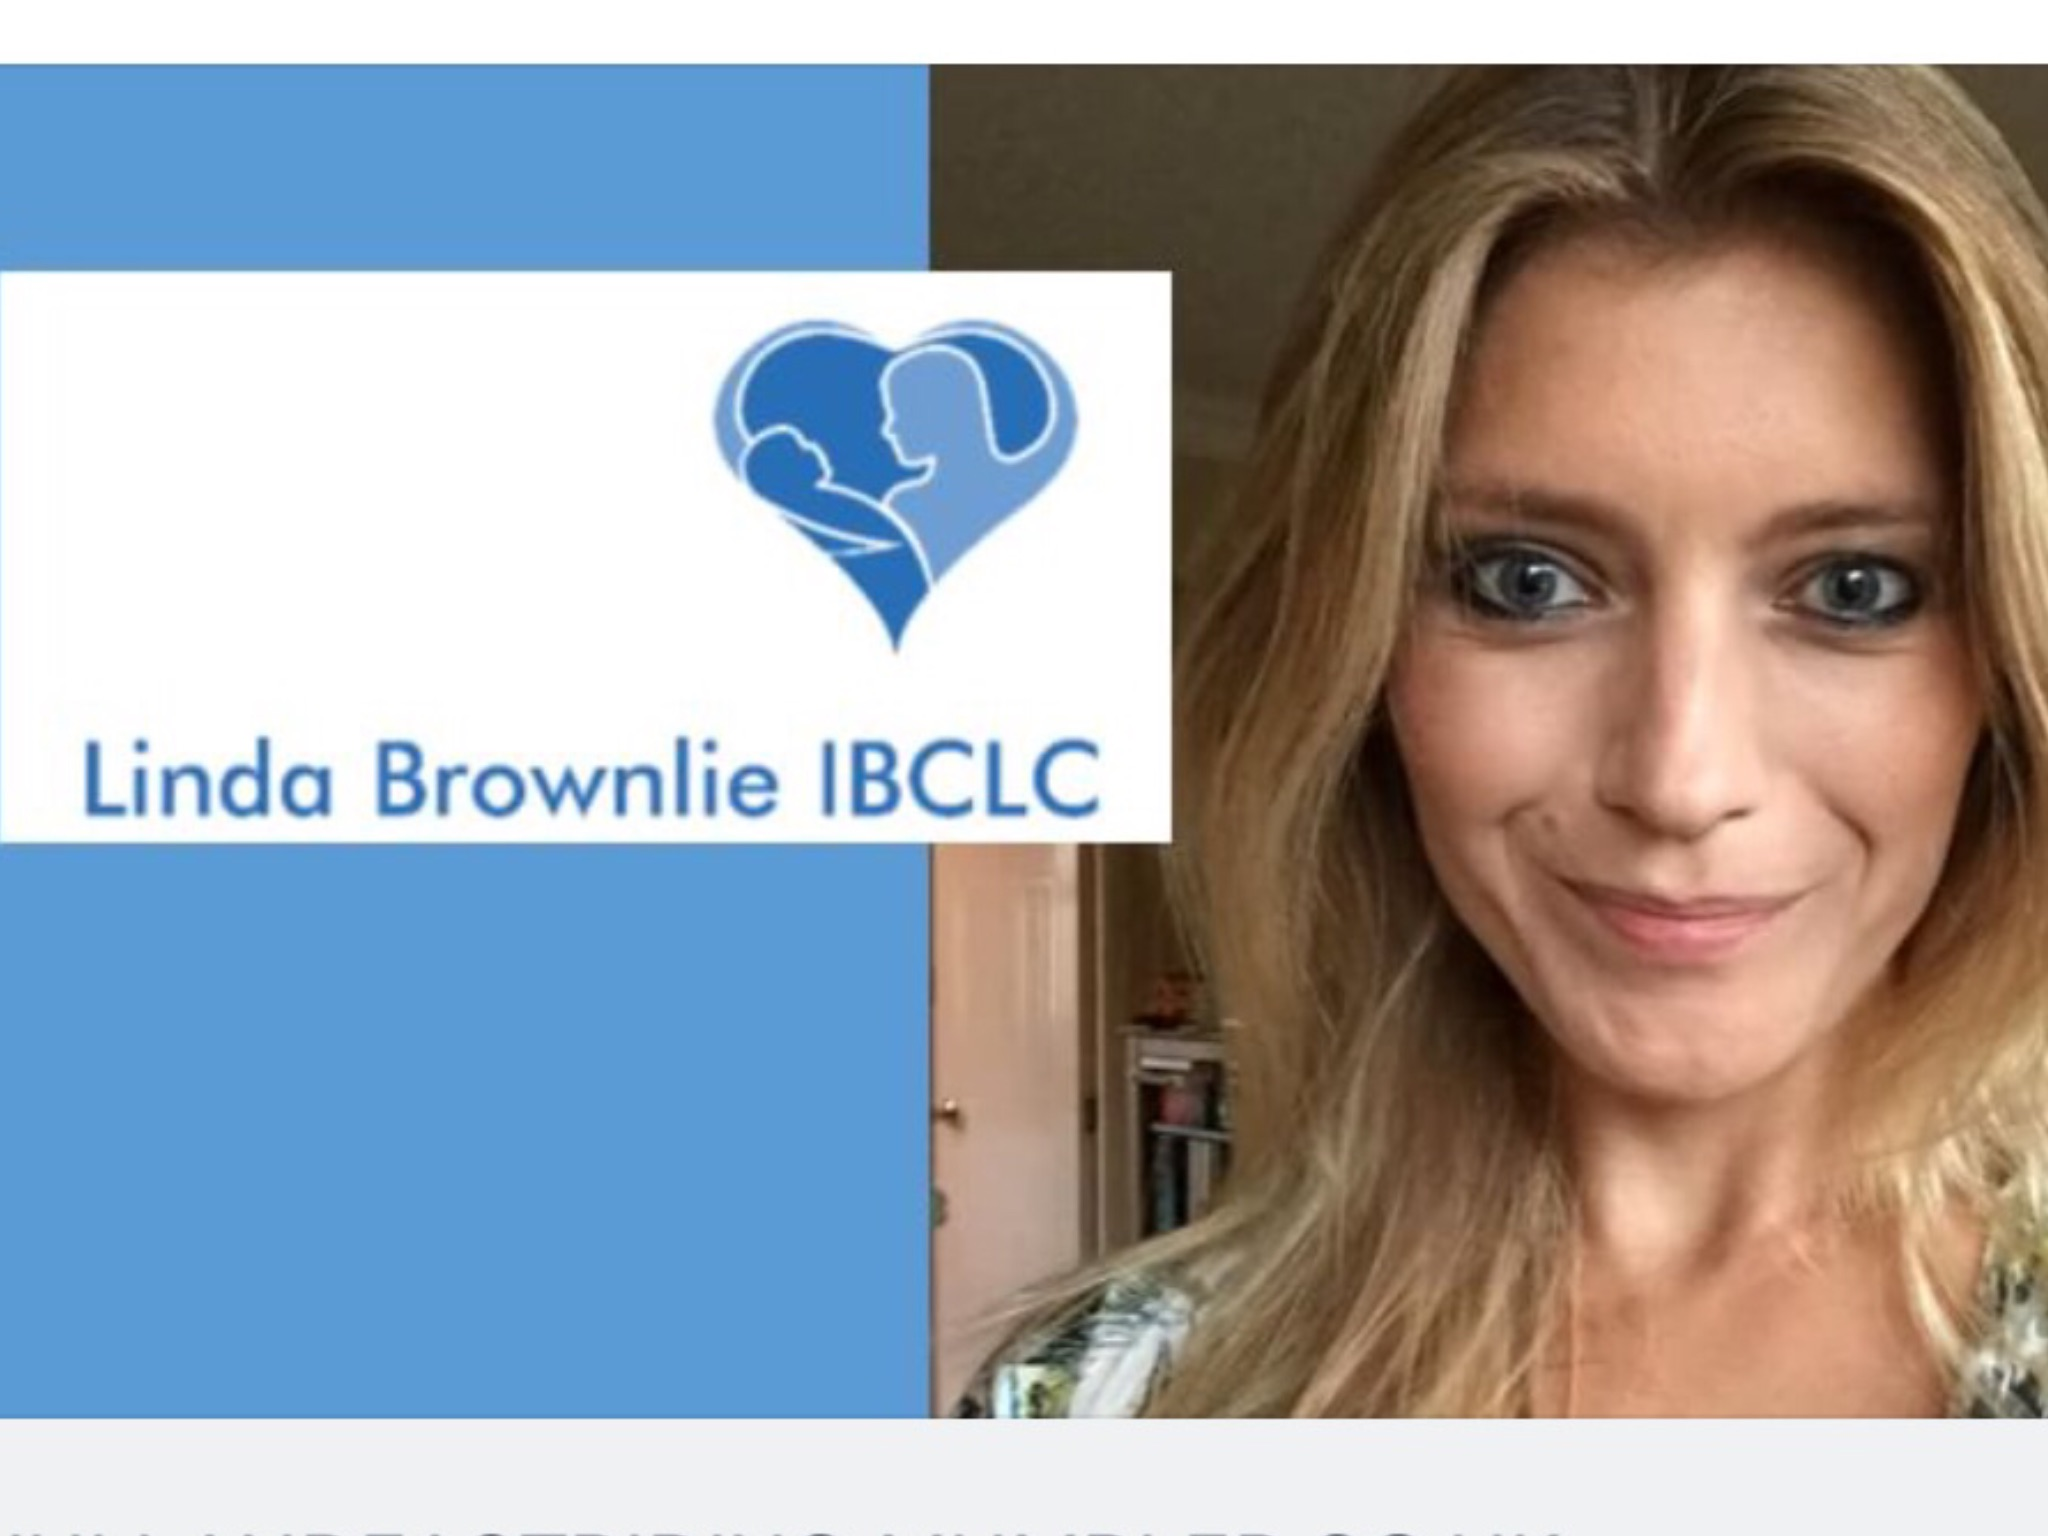 Linda Brownlie